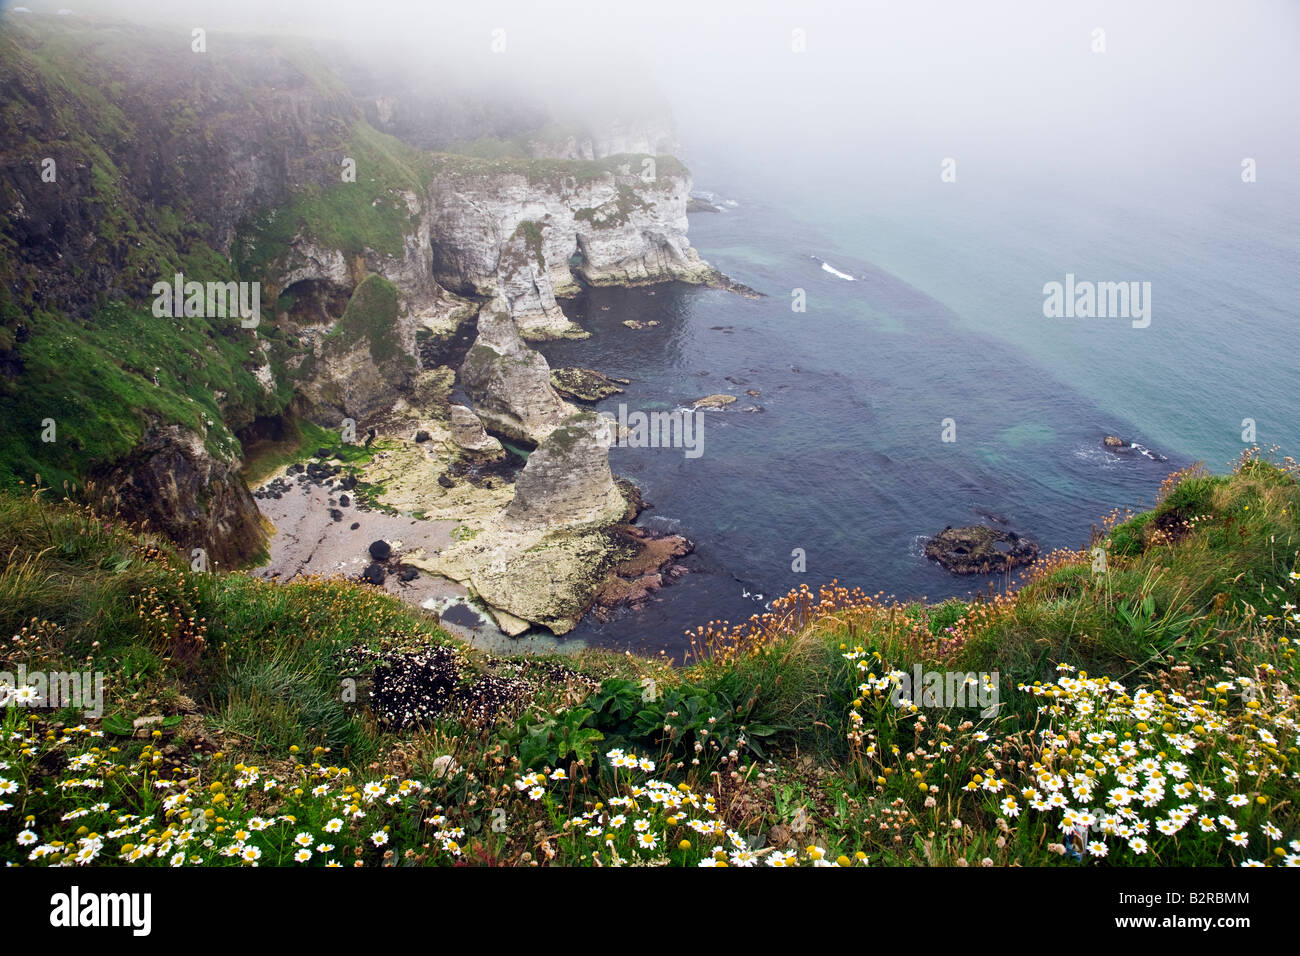 Sea Mist at White Rocks on the Antrim Coast near Portrush County Antrim Northern Ireland UK - Stock Image